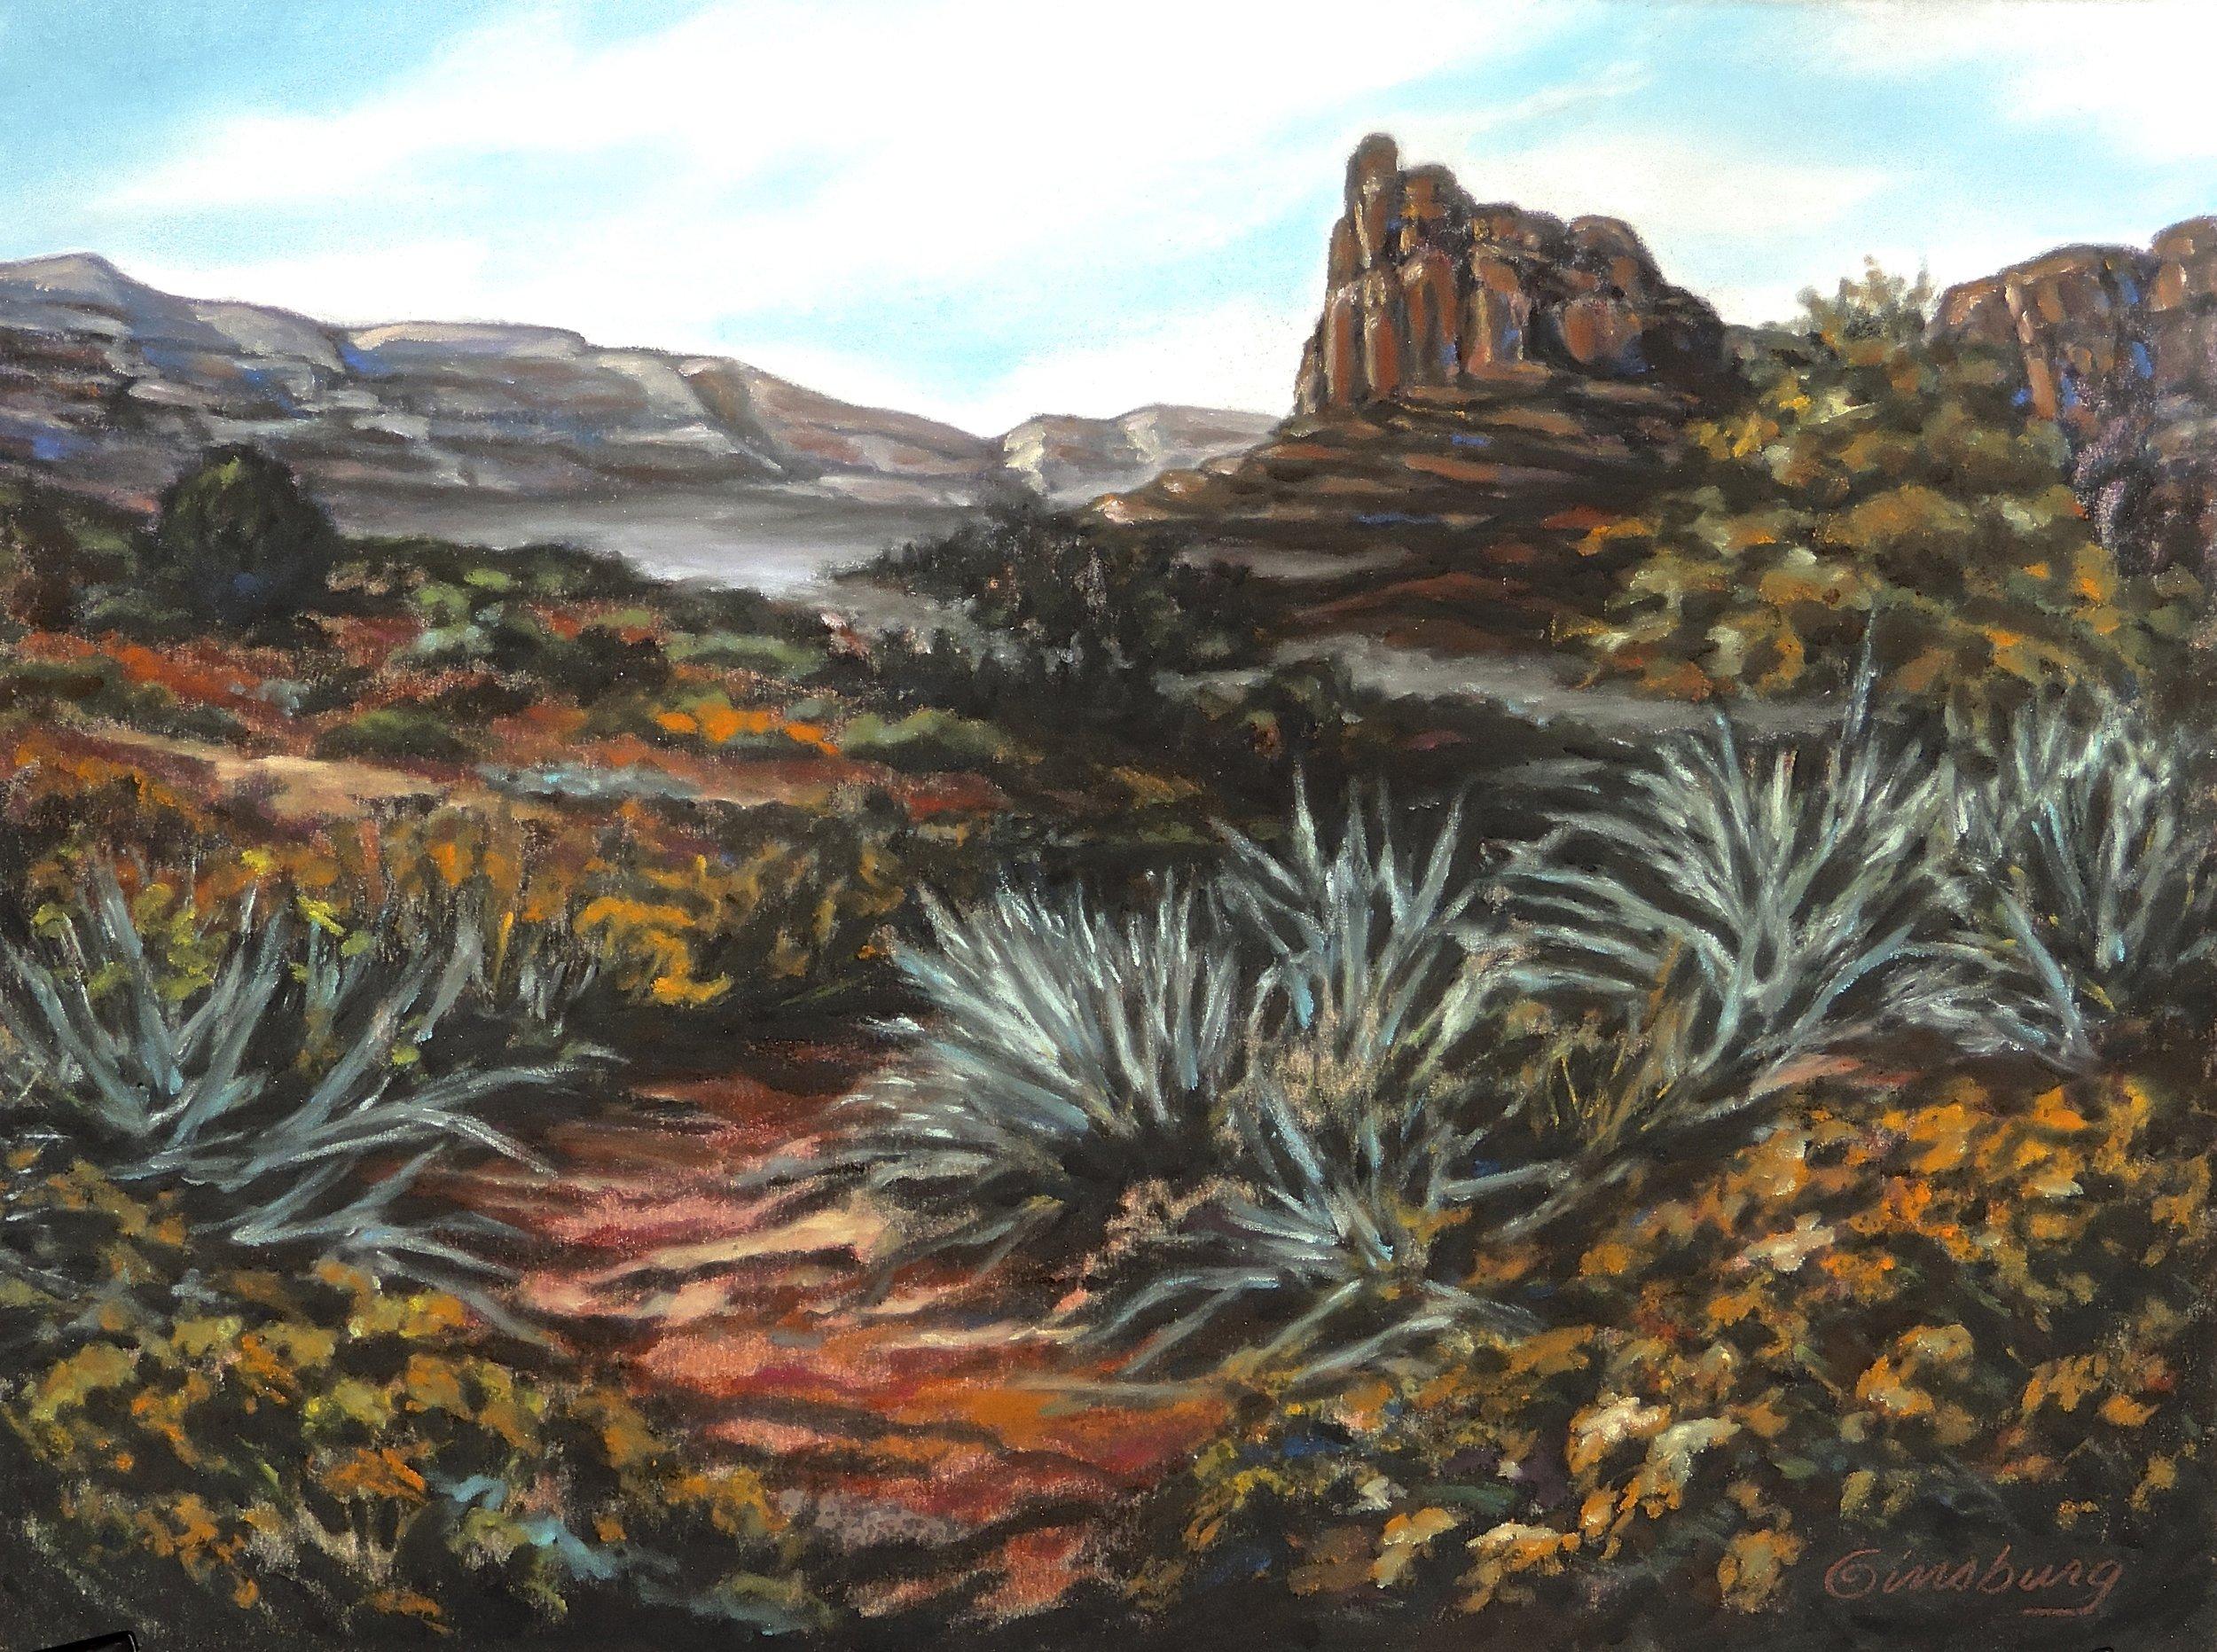 """MORNING MIST"", New Mexico  Pastel Cheri GInsburg ©"